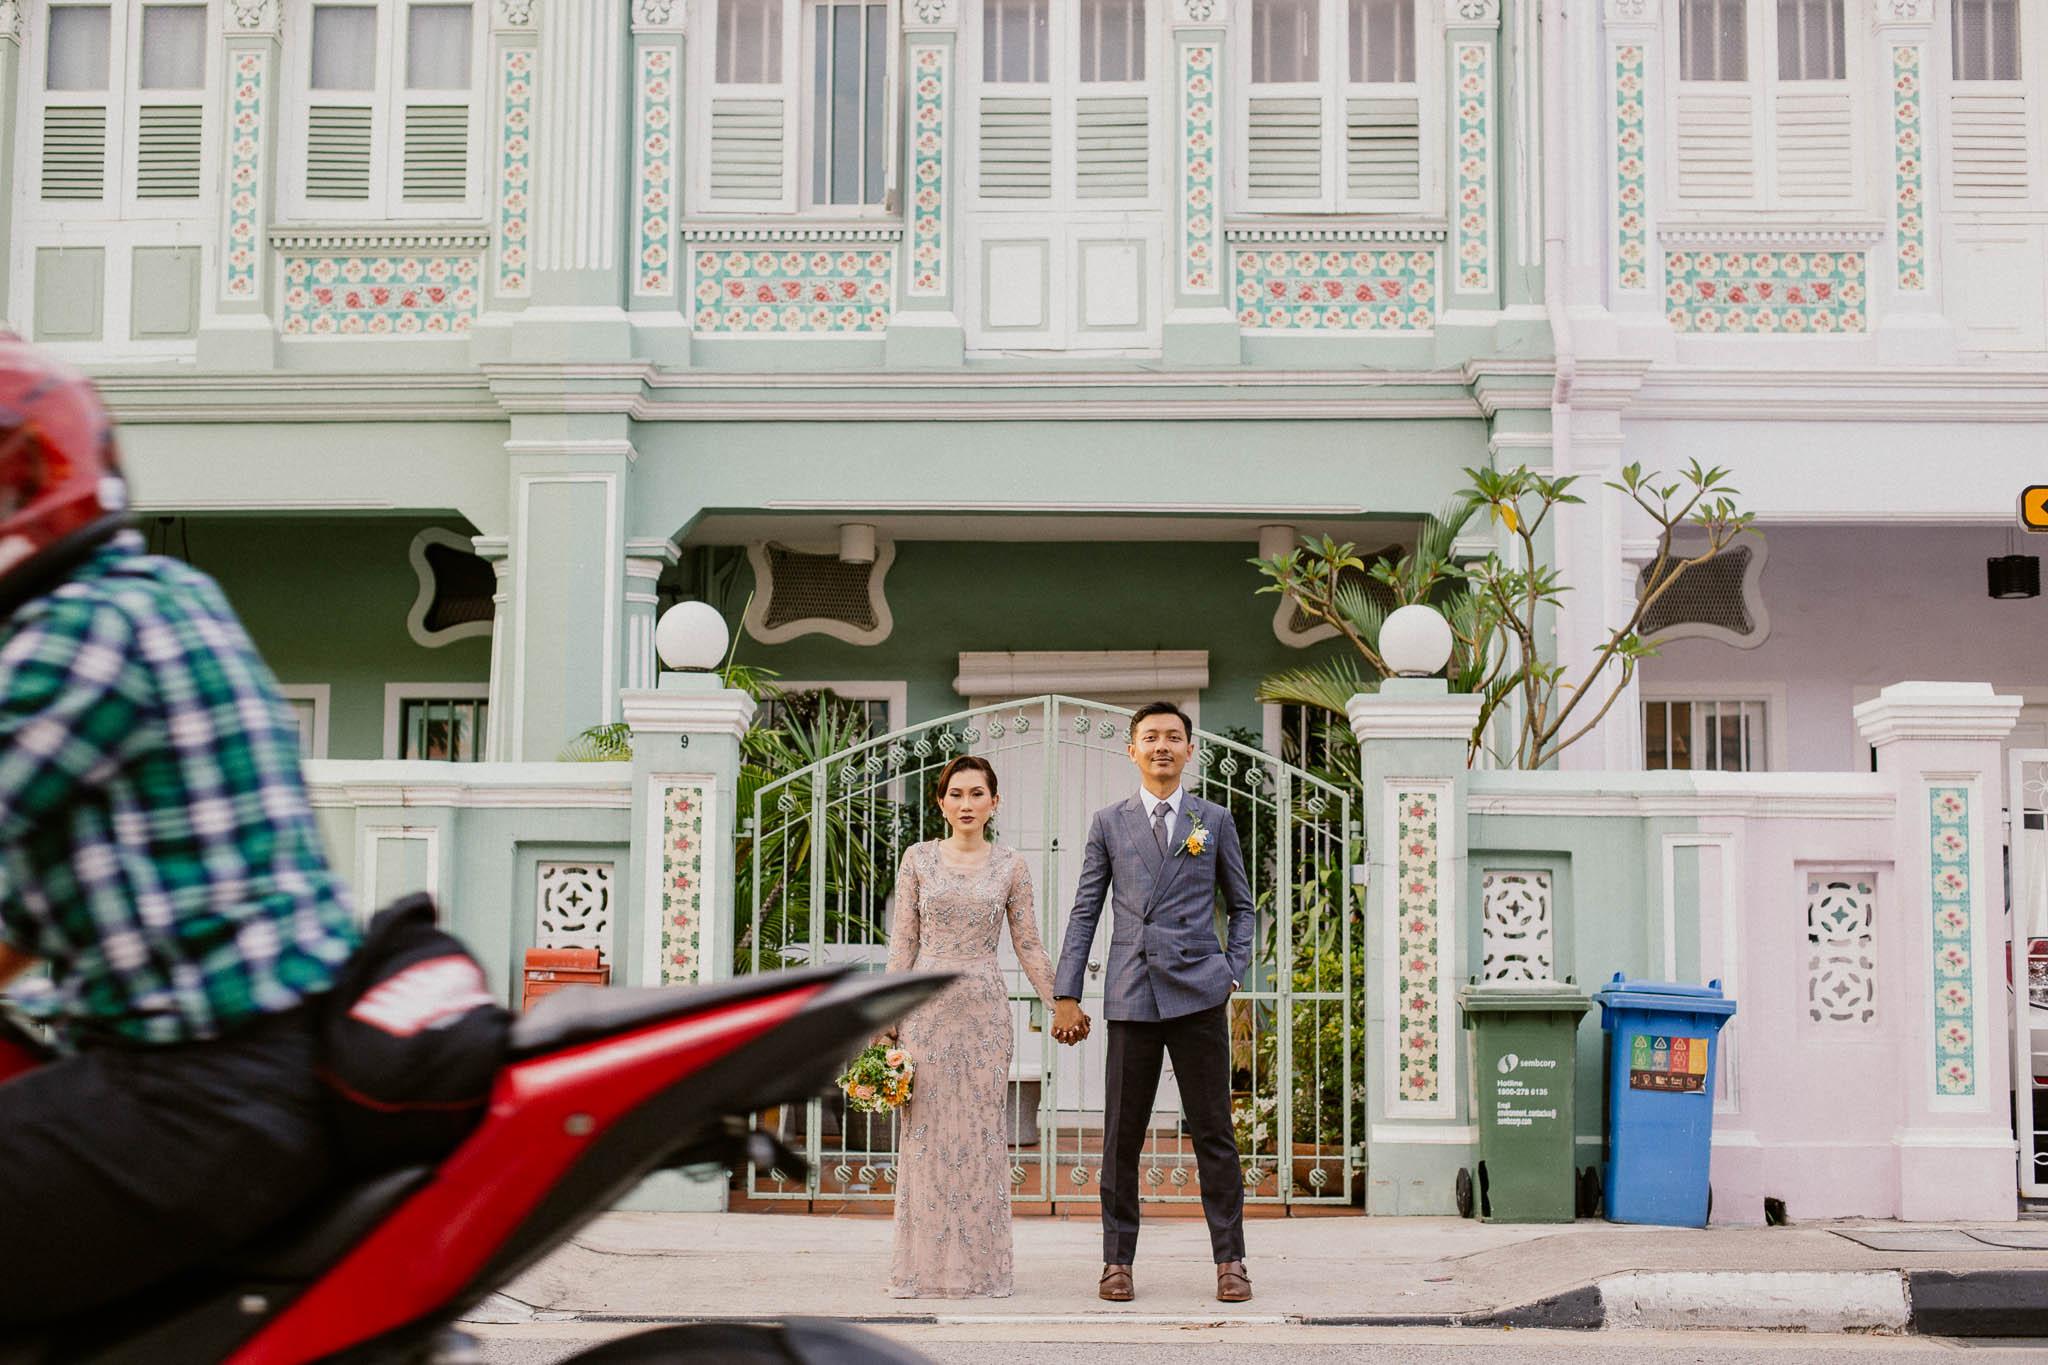 singapore-wedding-photographer-addafiq-nufail-077.jpg